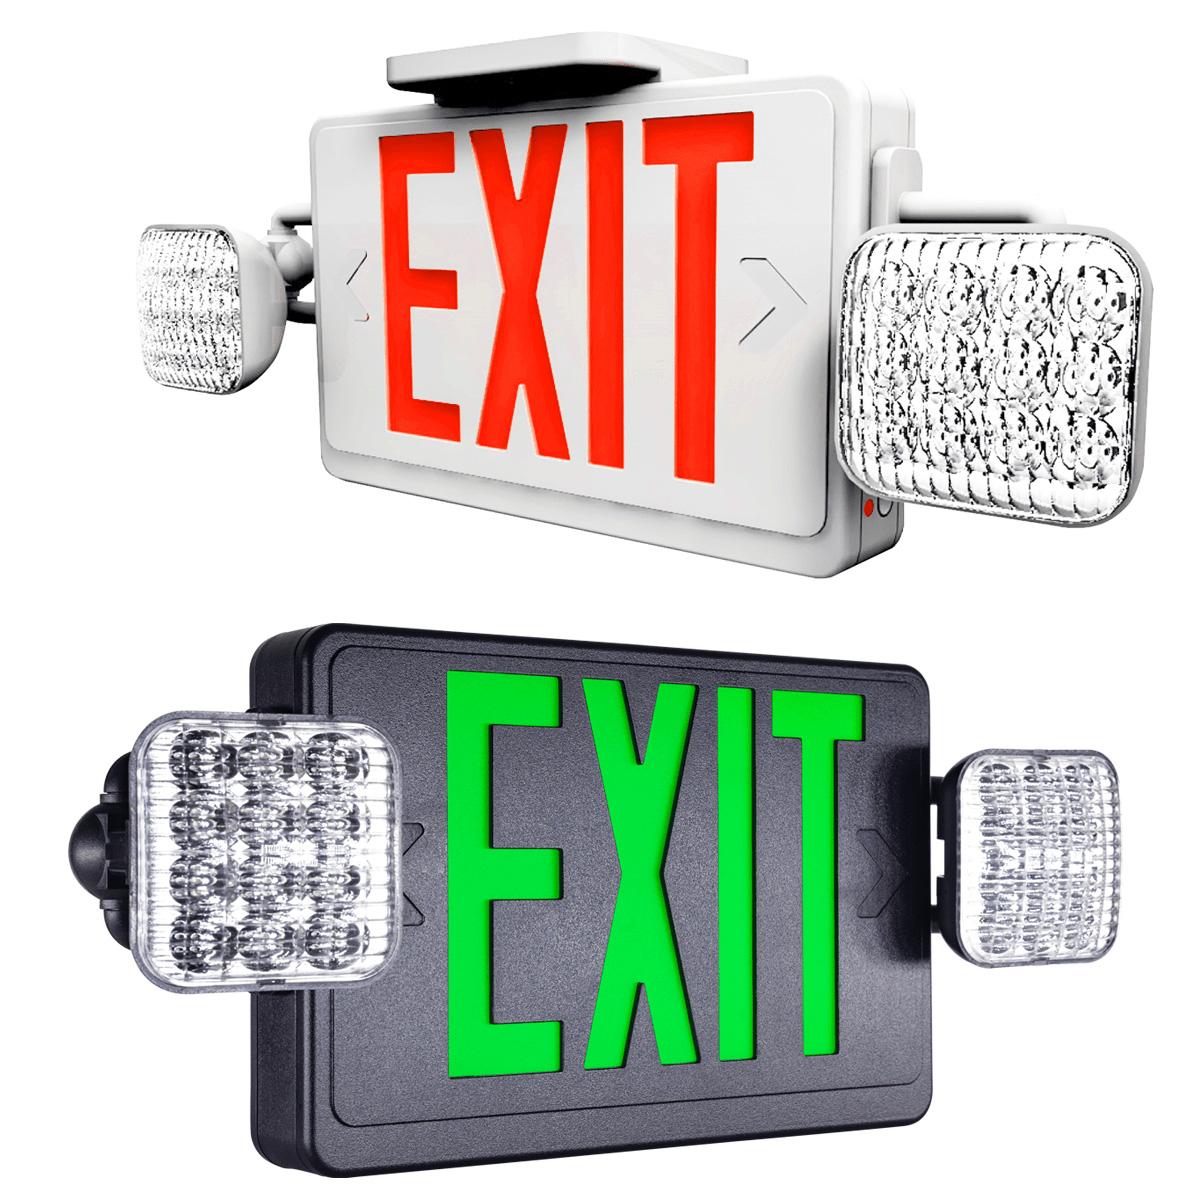 Standard Indoor LED Exit Sign With LED Emergency Lights Series: EETL